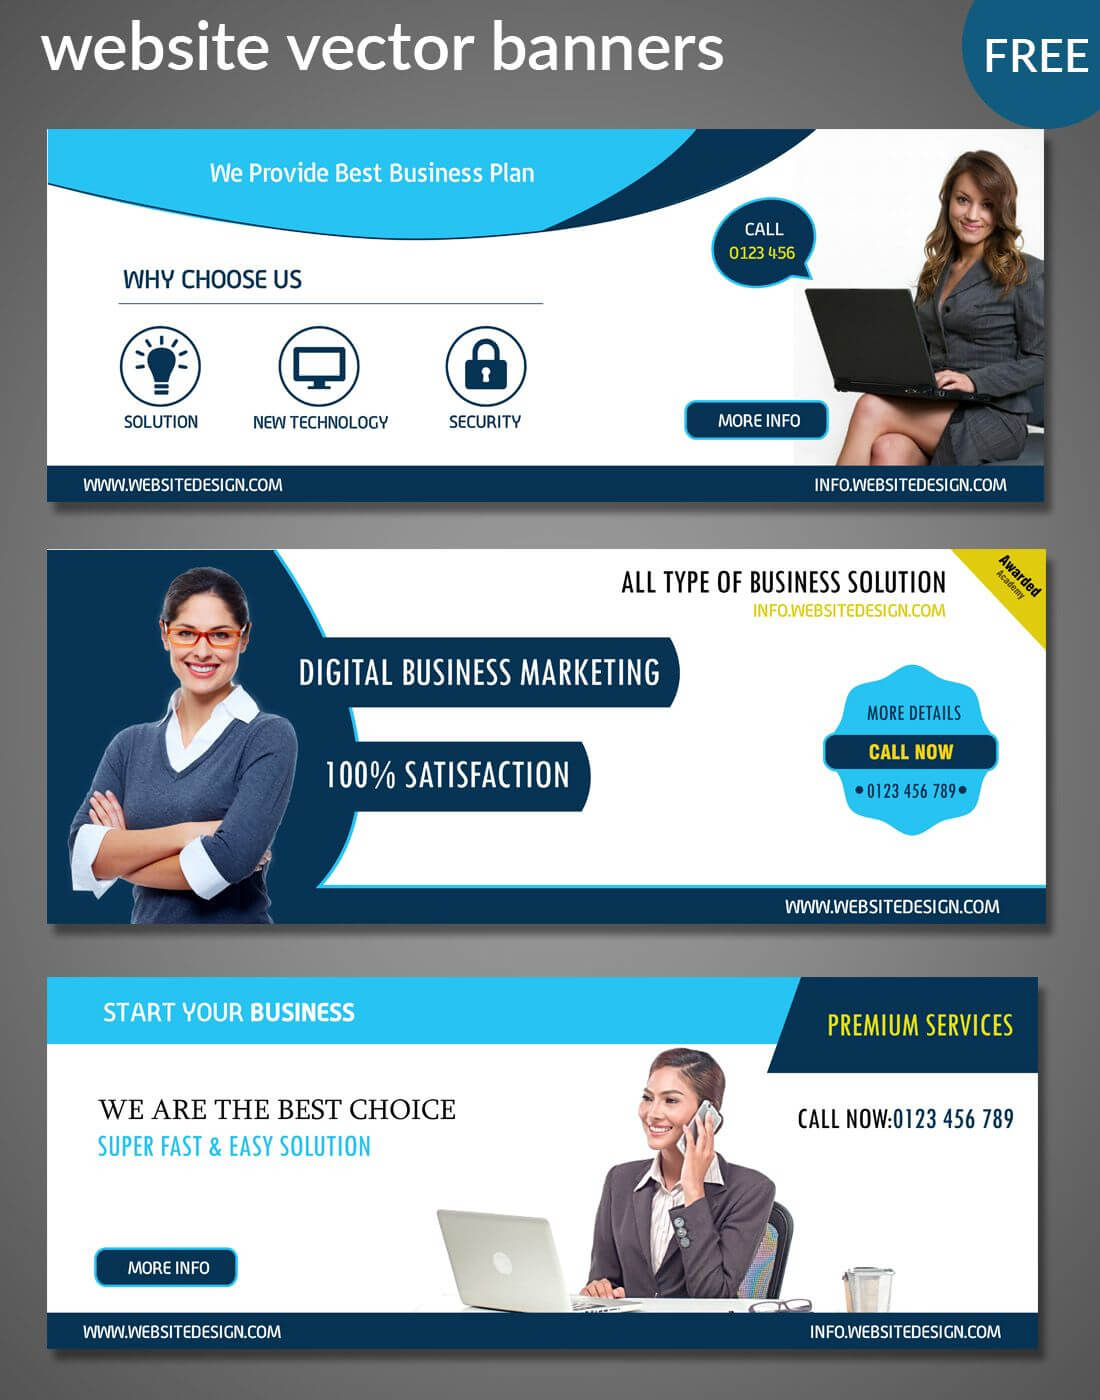 Website Banners Templates | Free Website Psd Banners Regarding Website Banner Templates Free Download